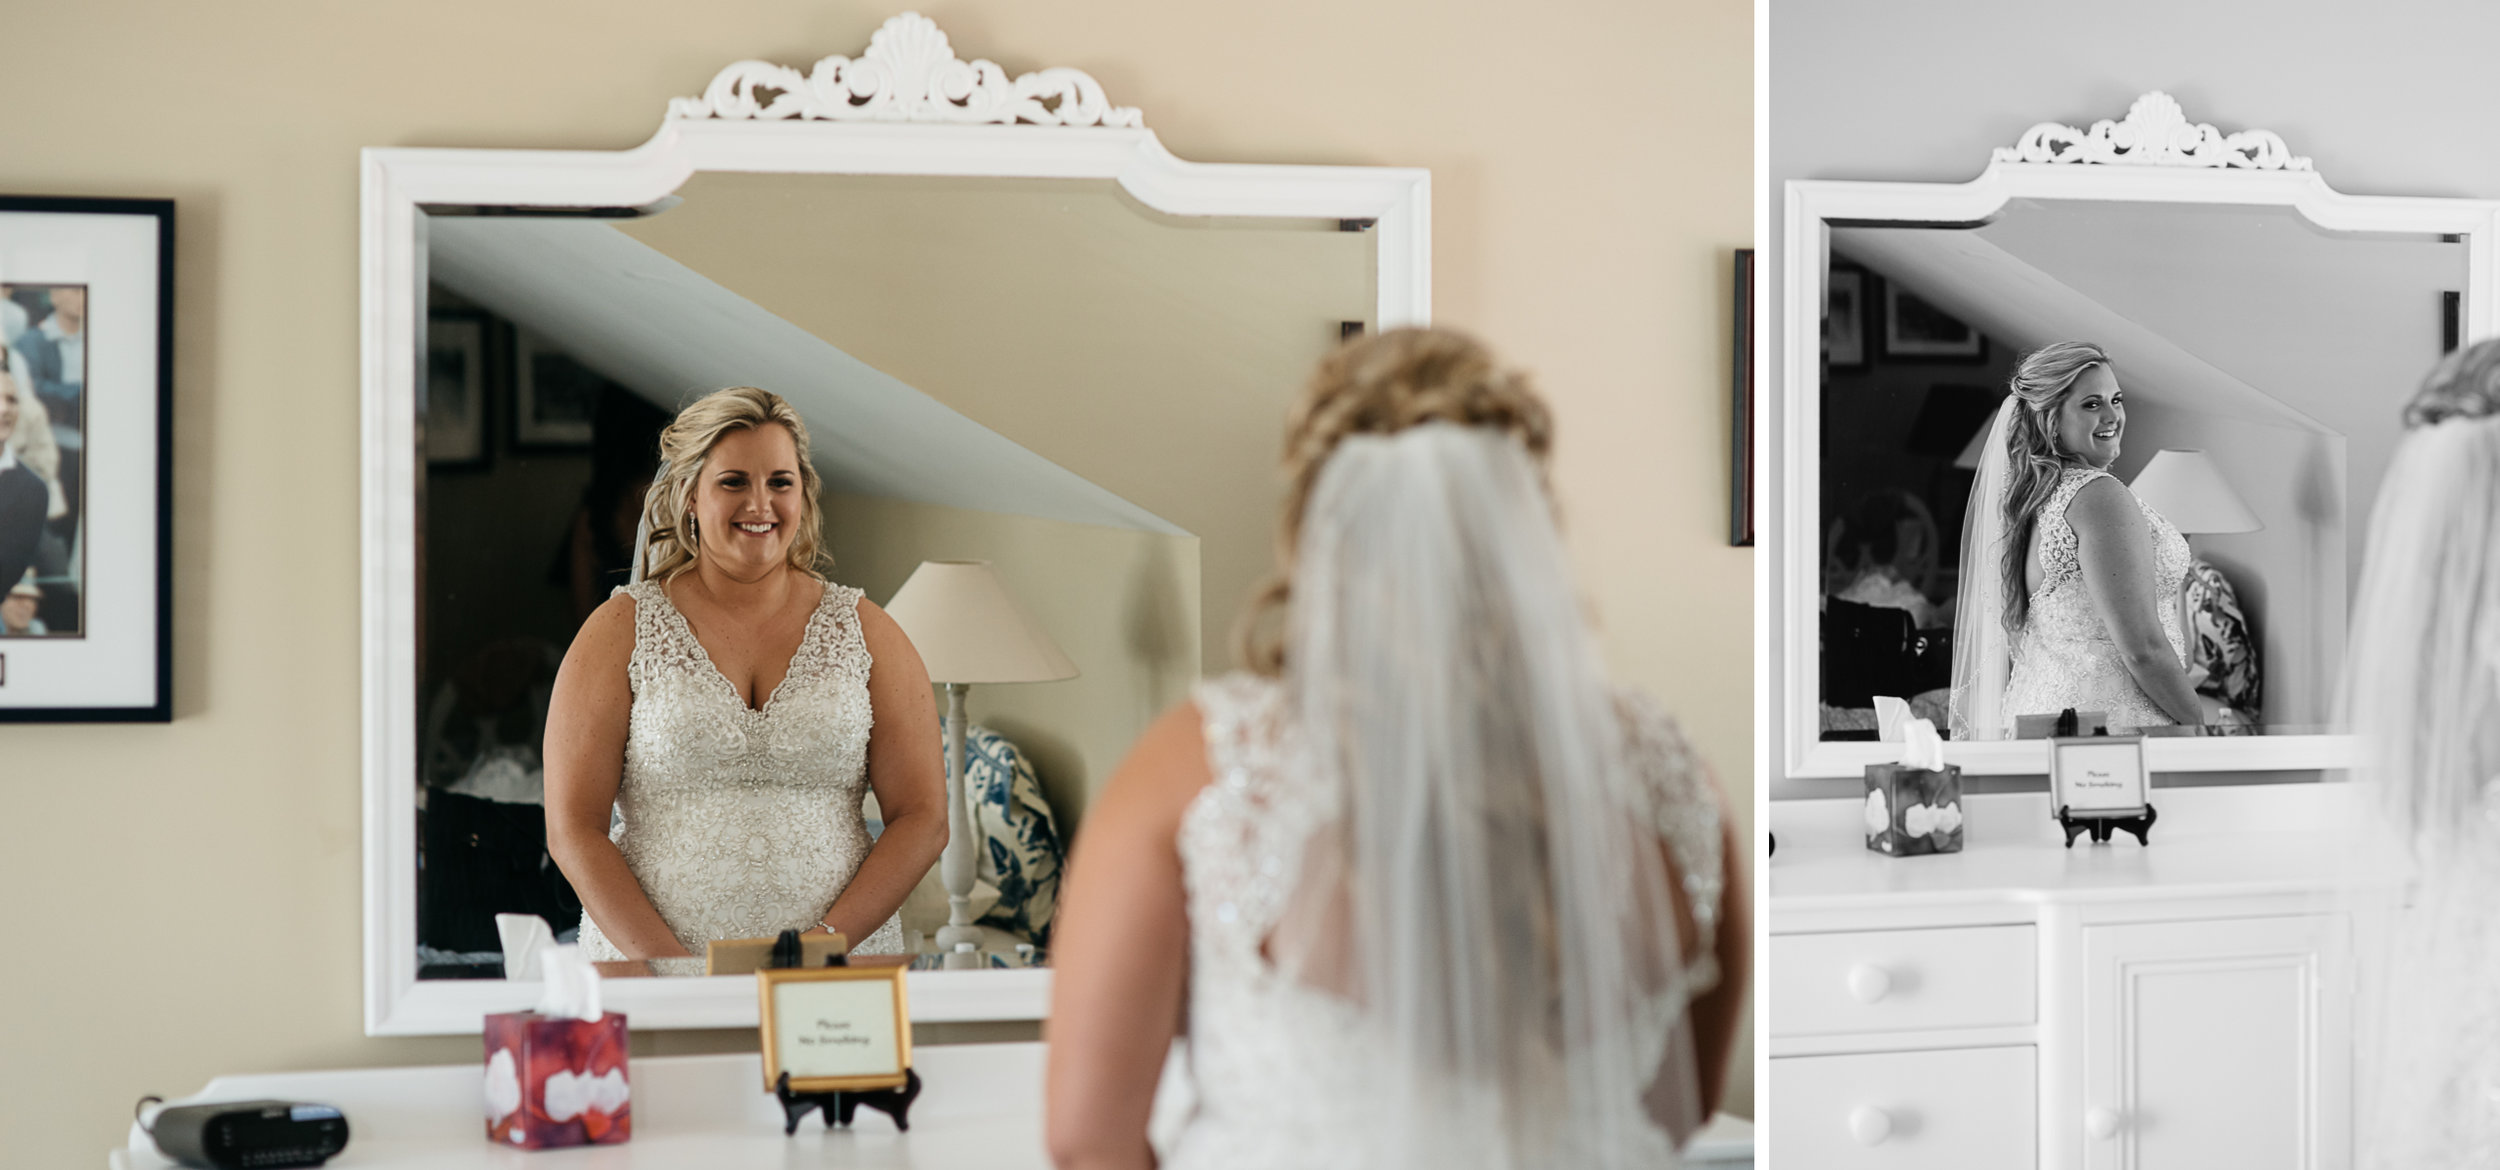 wedding photographer ligonier pennsylvania.jpg